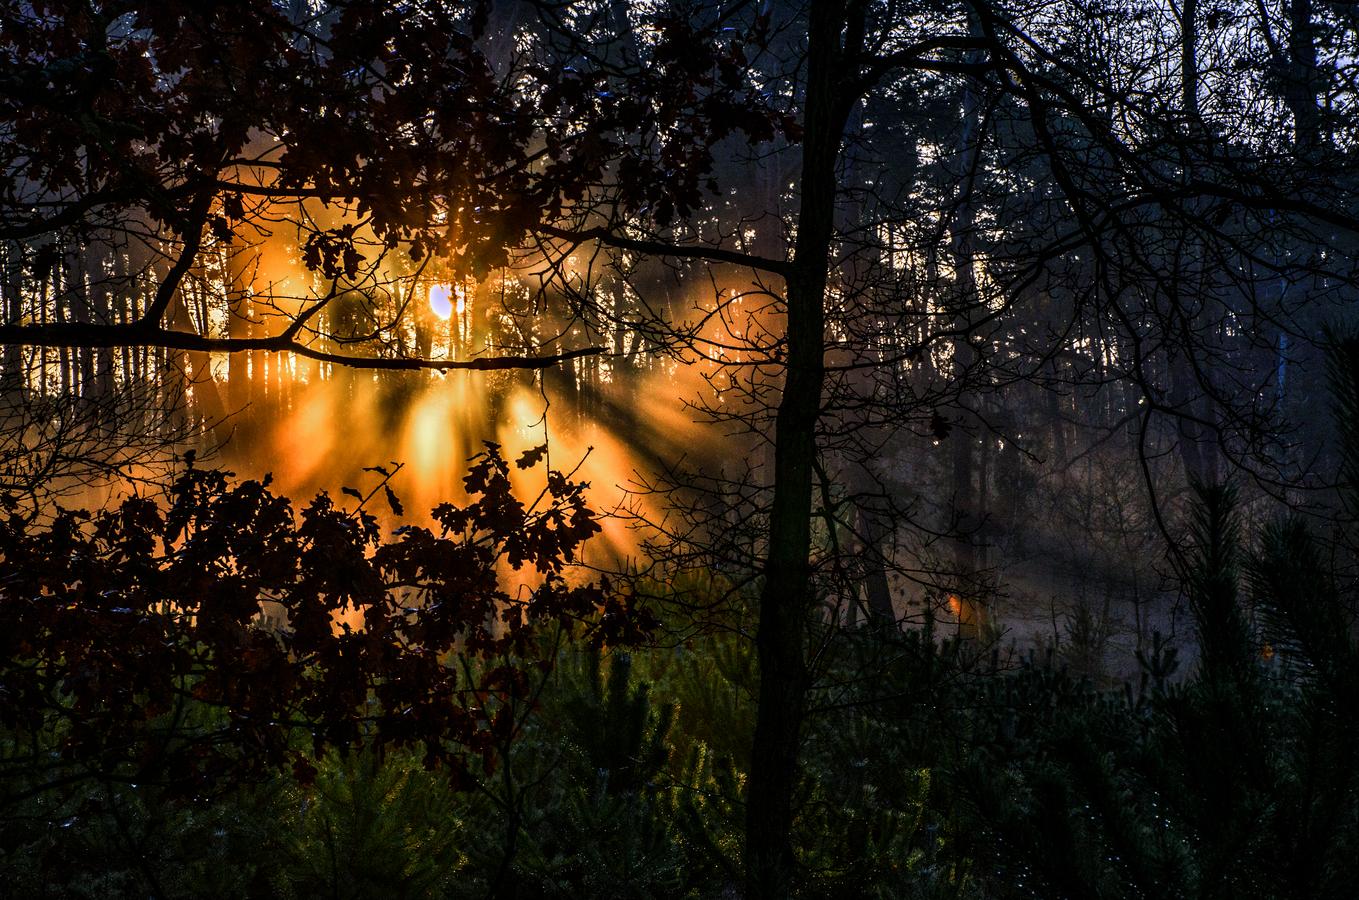 V tajemném lese